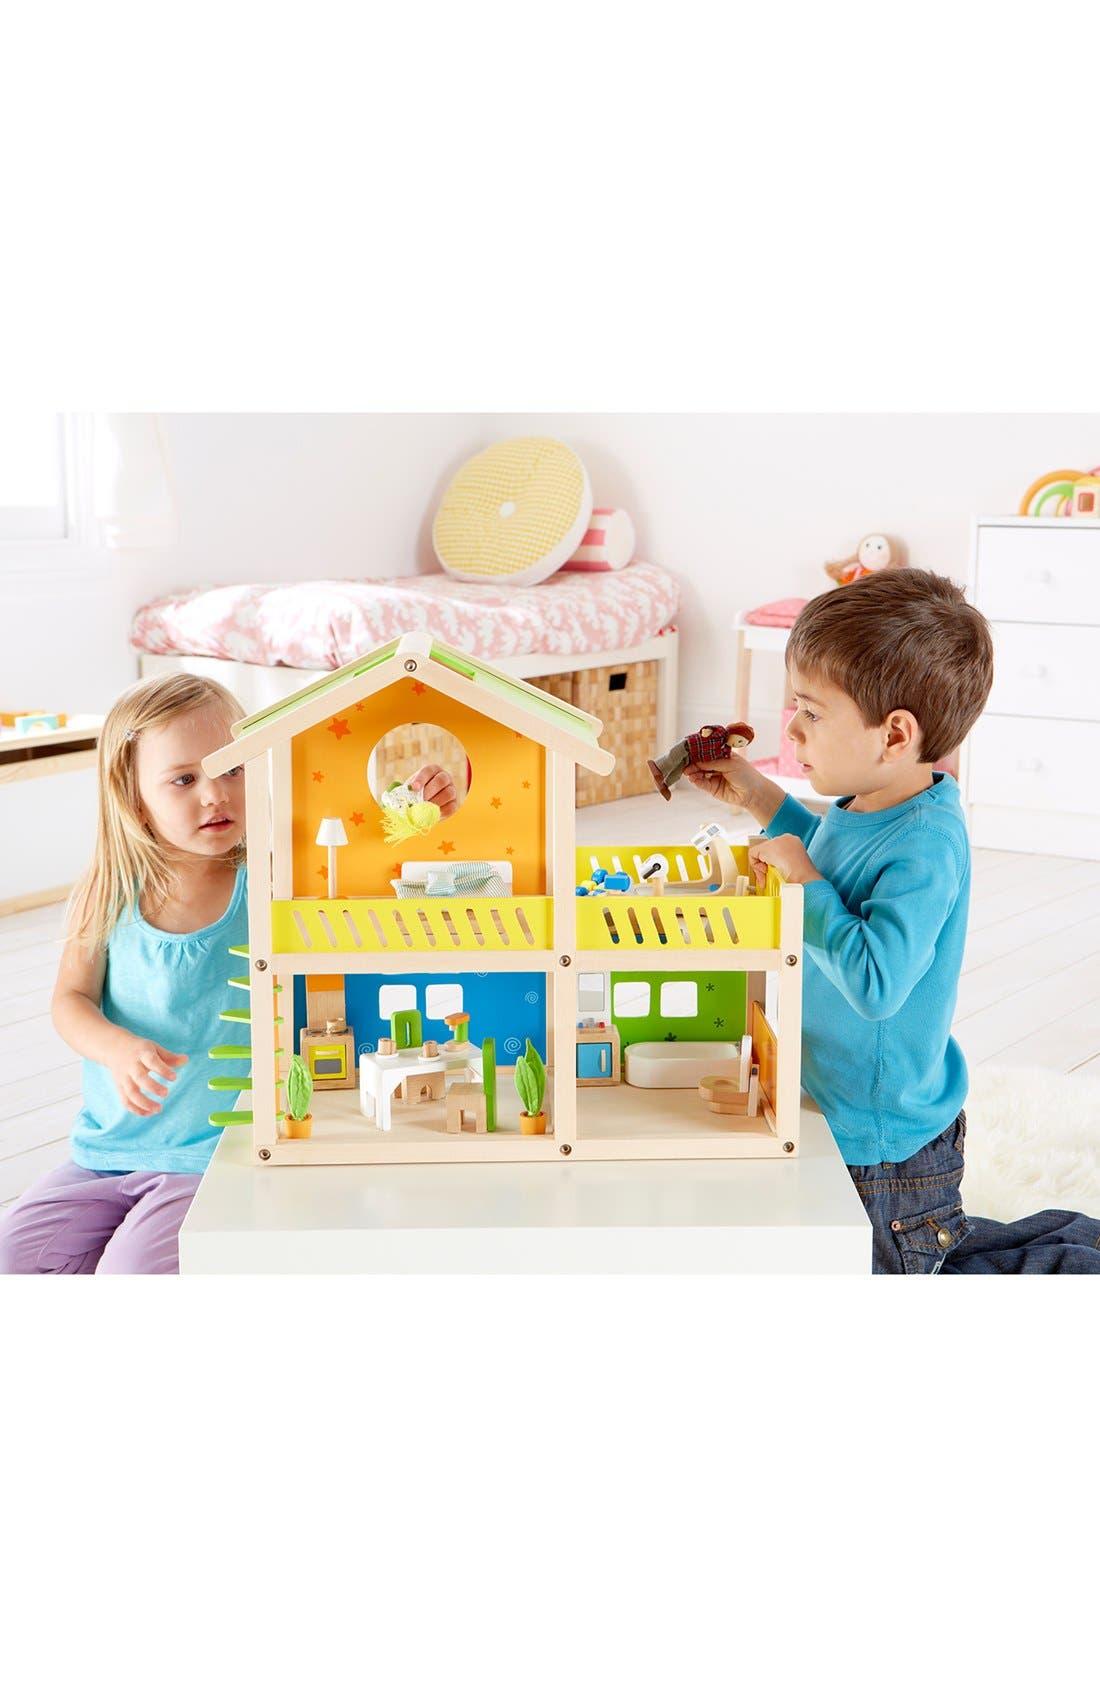 'Happy Villa' Wooden Dollhouse,                             Alternate thumbnail 3, color,                             000